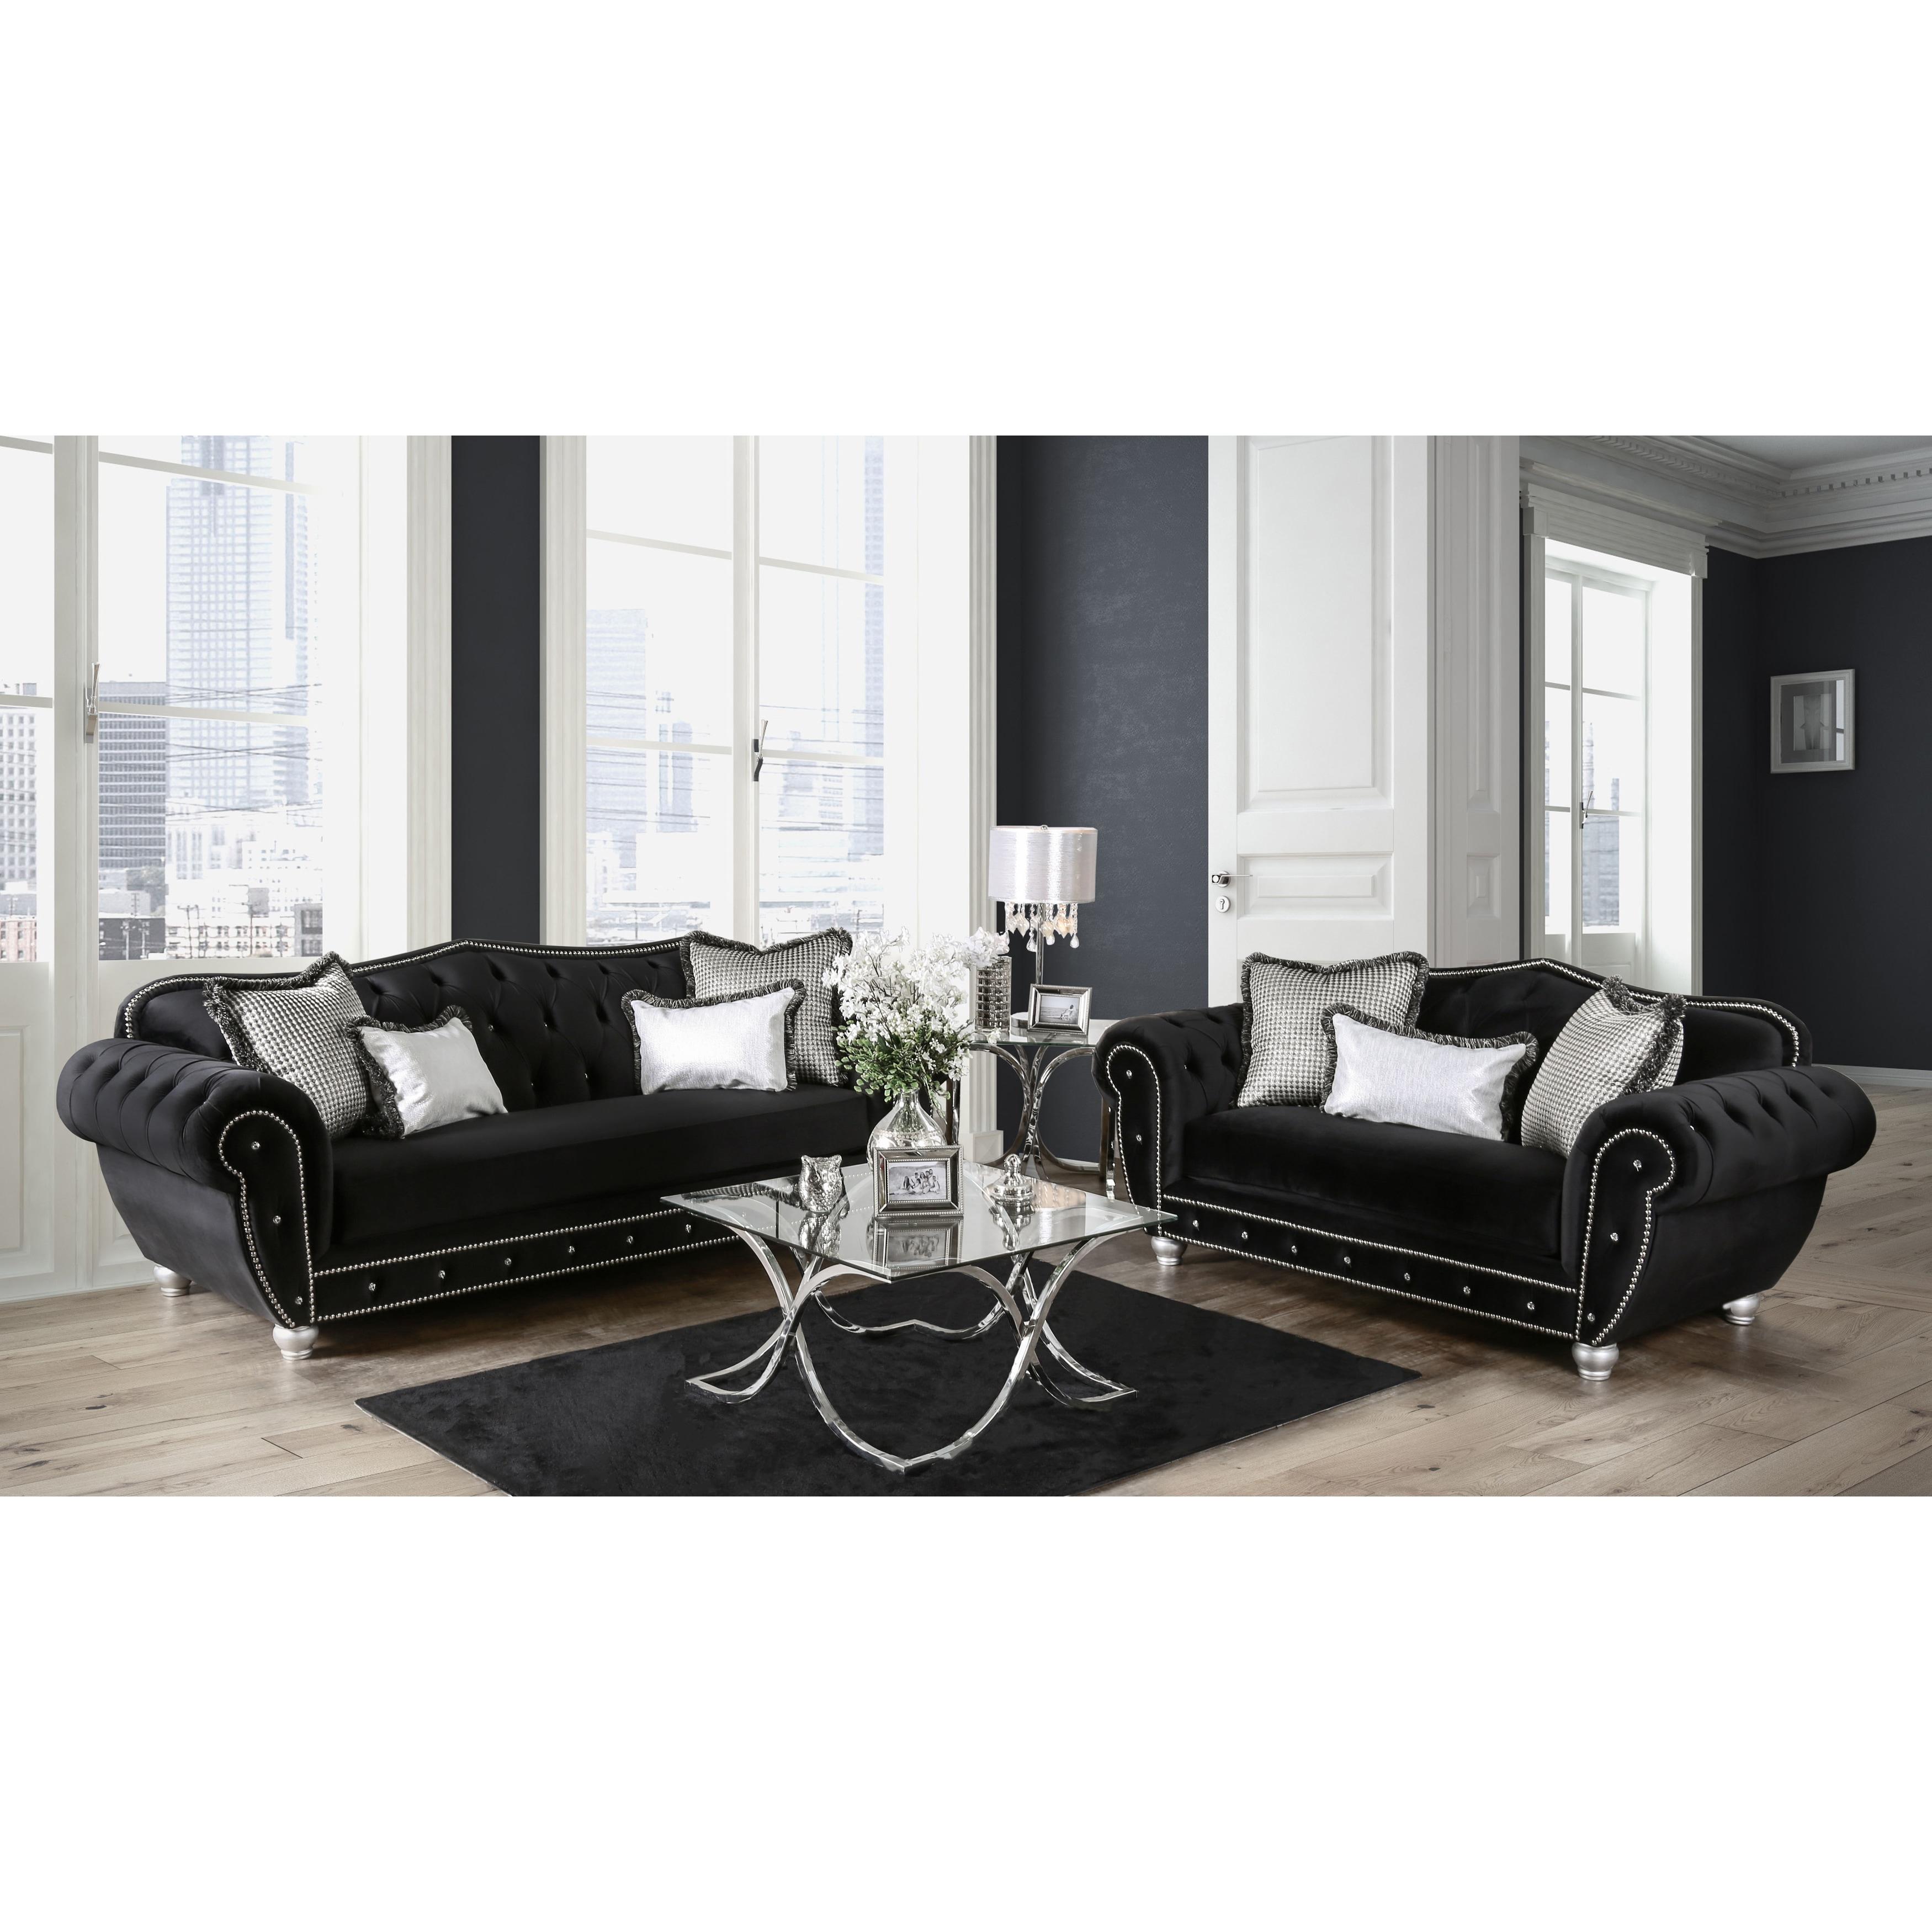 Beau Shop Furniture Of America Renee Formal 2 Piece Premium Black Tufted Velvet  Sofa Set   On Sale   Free Shipping Today   Overstock.com   13767801